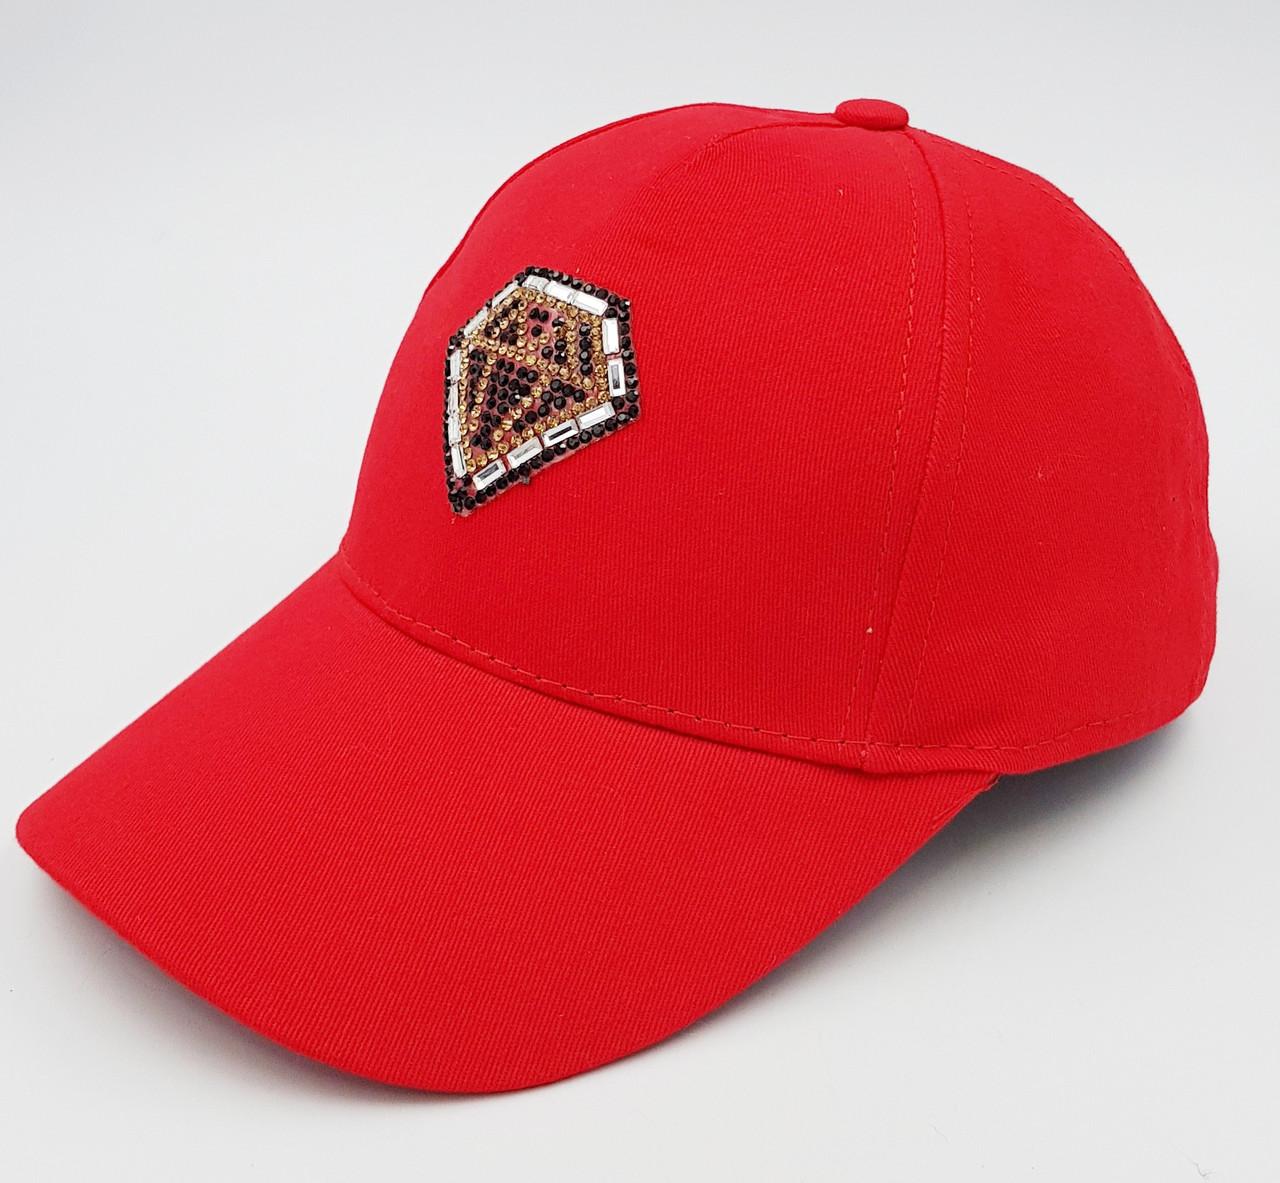 Женская бейсболка Klaus Рубин  Коттон Красный One size -Демисезон (035-К)